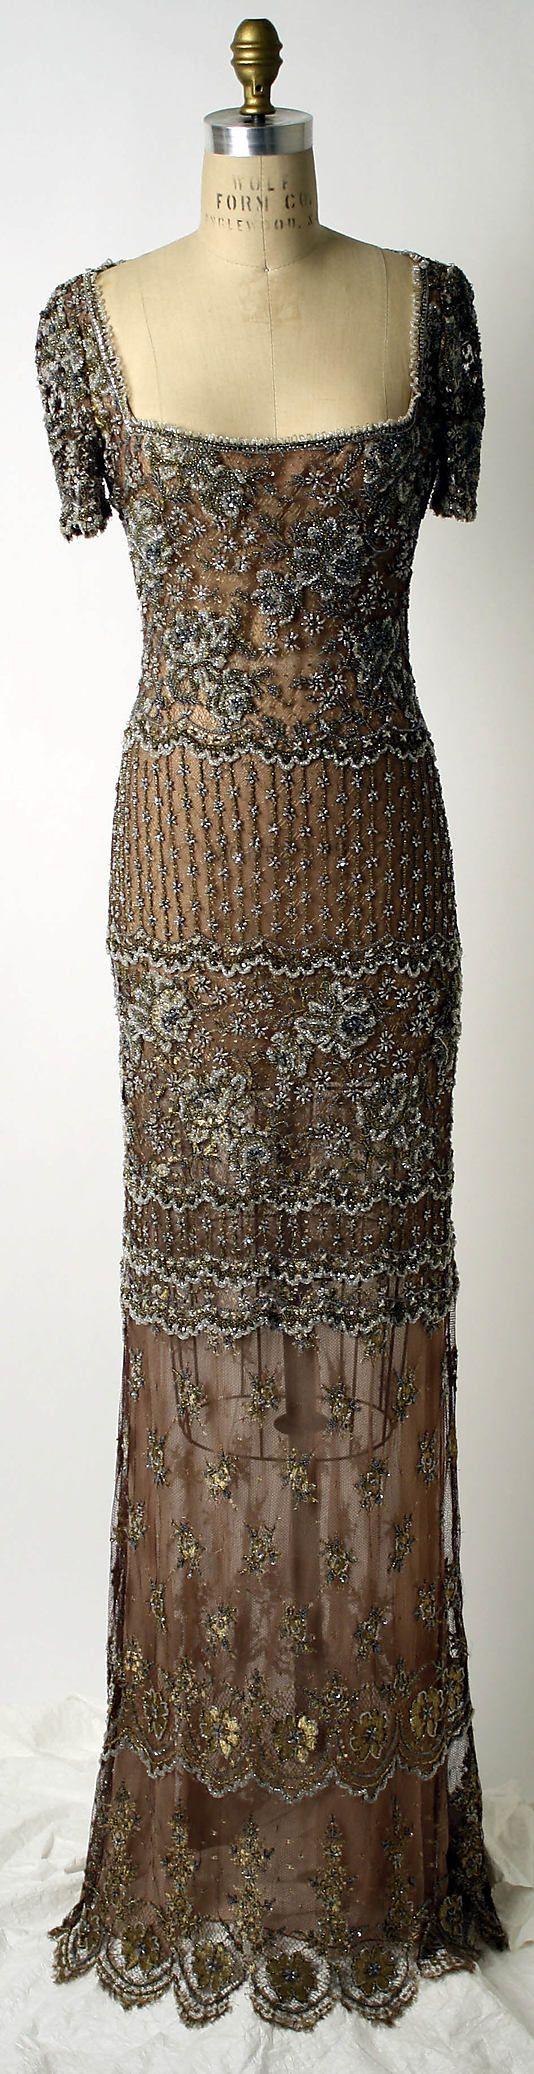 Badgley Mischka, 1997-98: Evening Dresses, Woman Fashion, Fashion Shoes, Evening Gowns, The Dresses, Badgley Mischka, Mischka Dresses, Downton Abbey, Badgleymischka